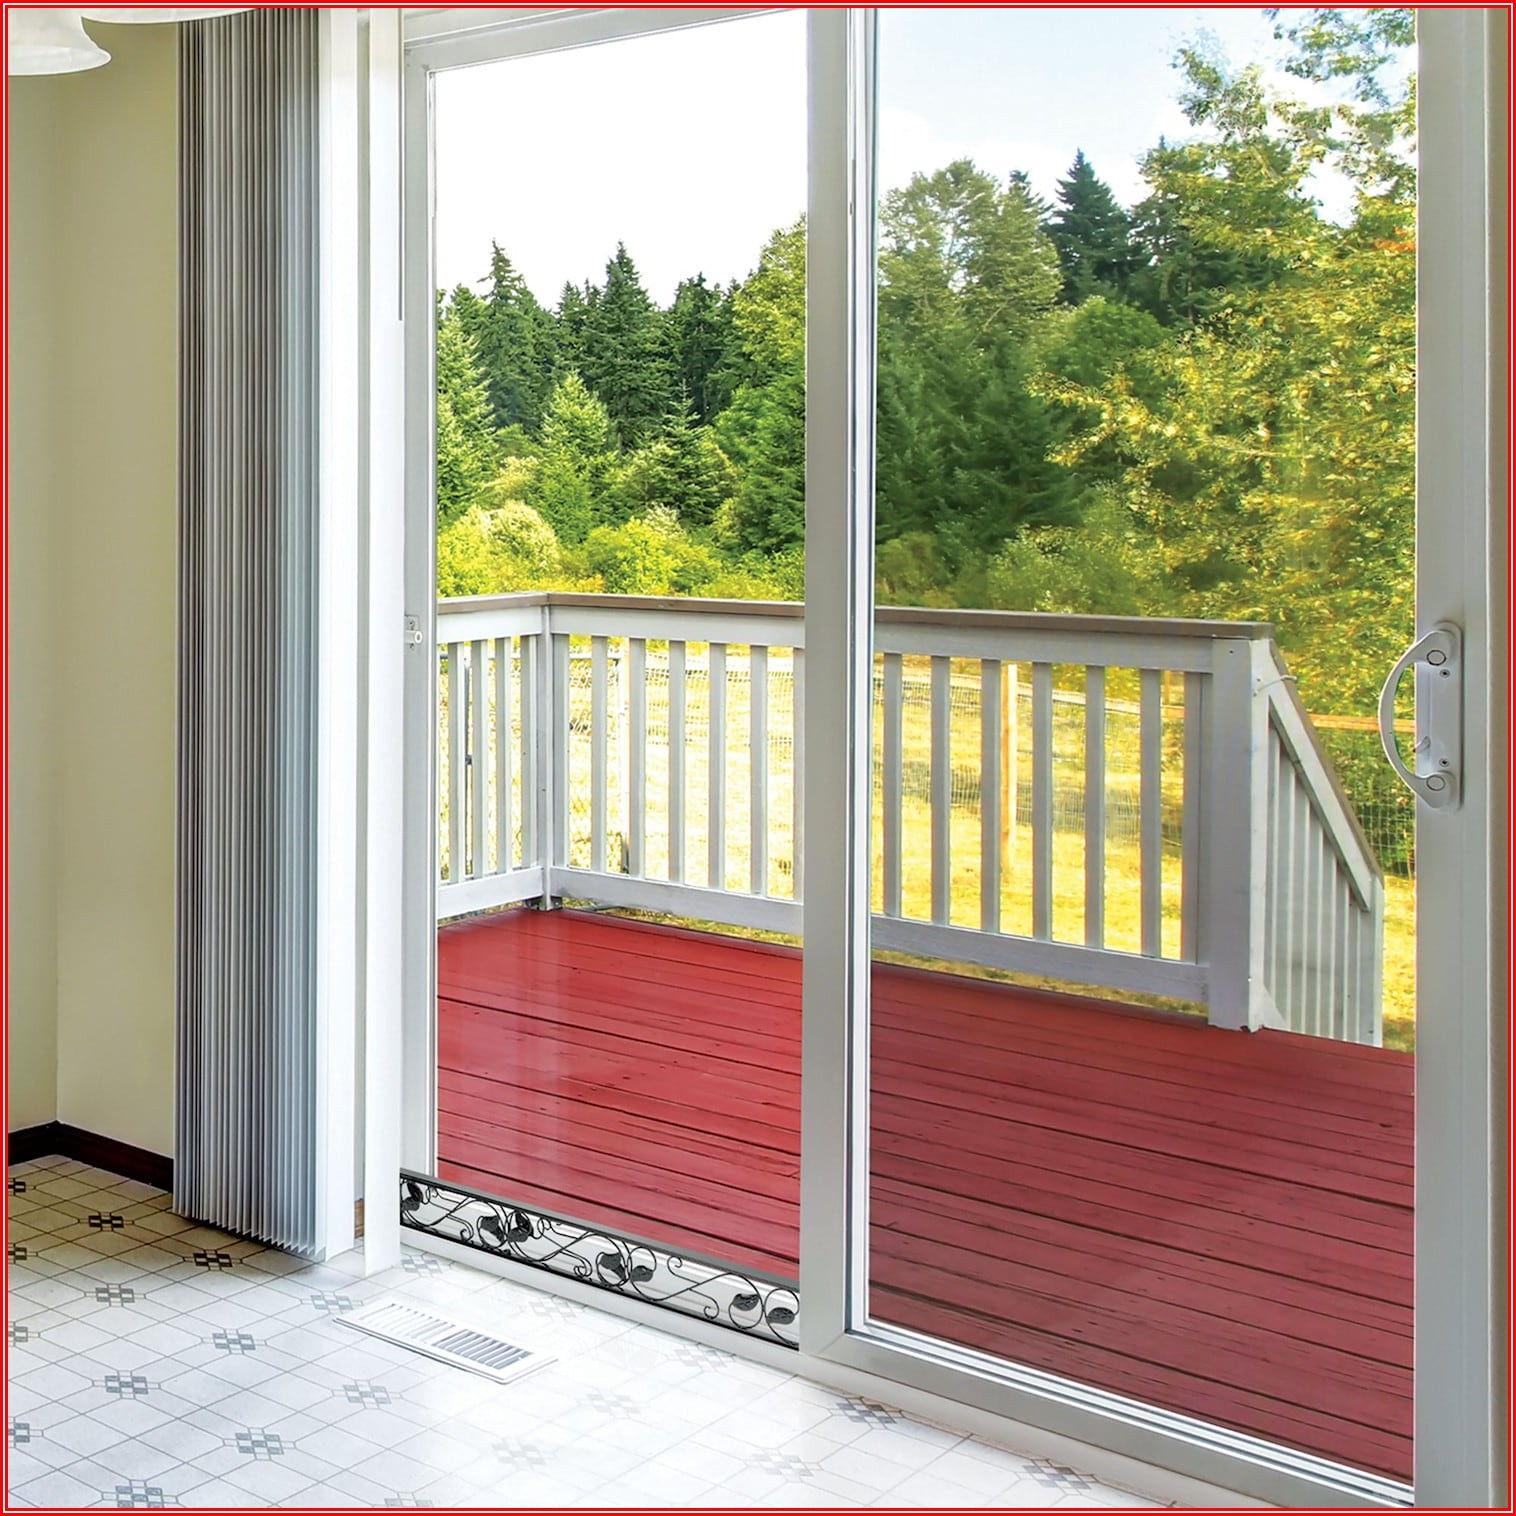 Adjustable Patio Door Security Bar